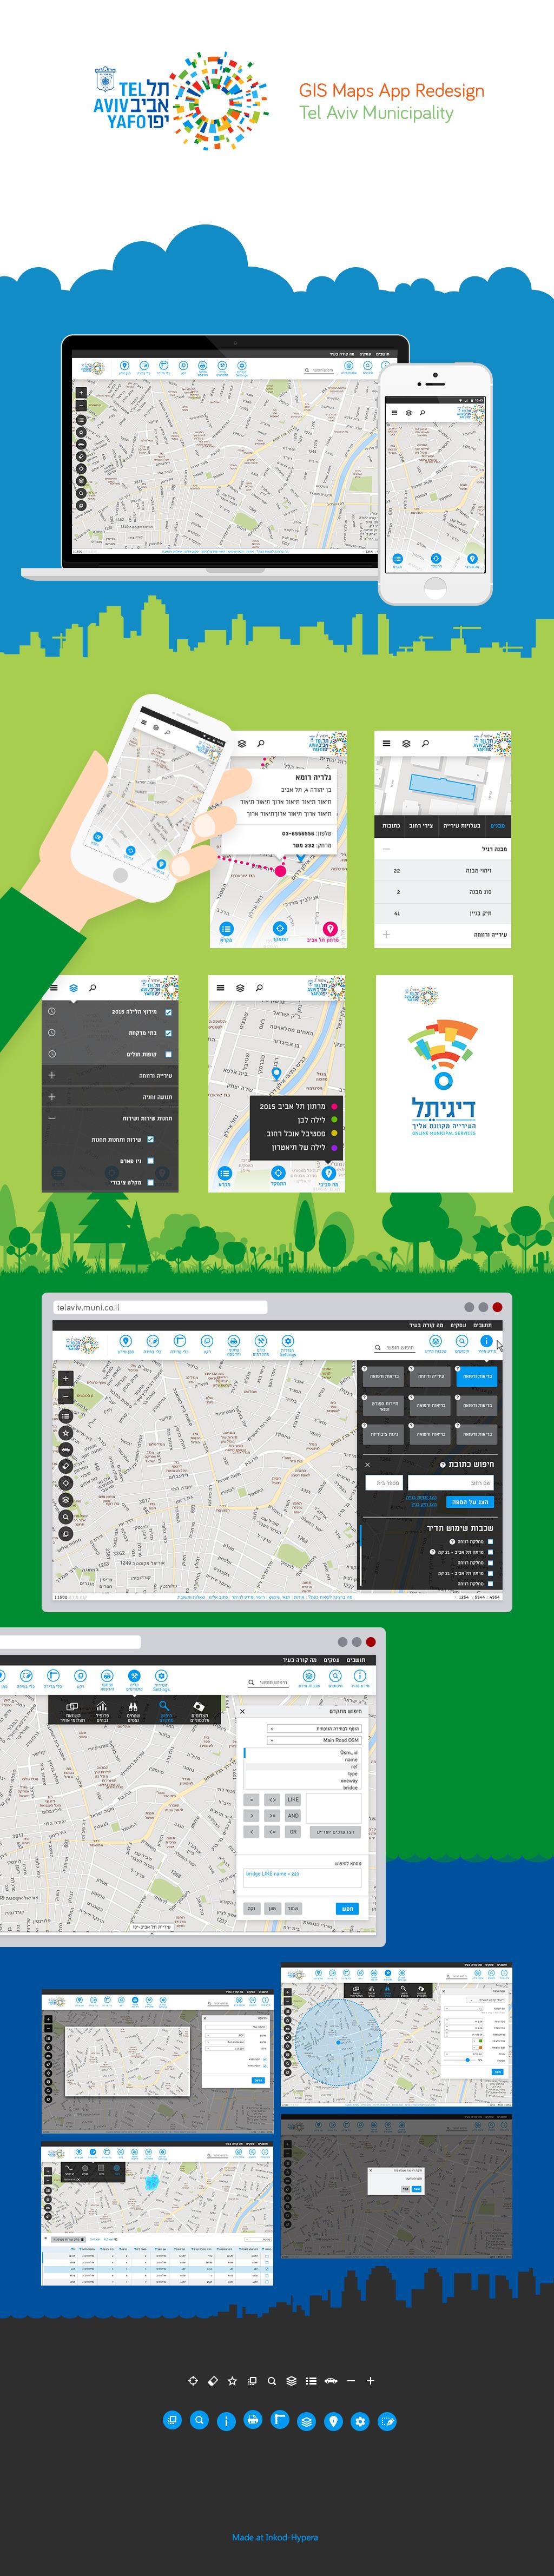 GIS maps UI design for Tel Aviv municipal GIS mapping system